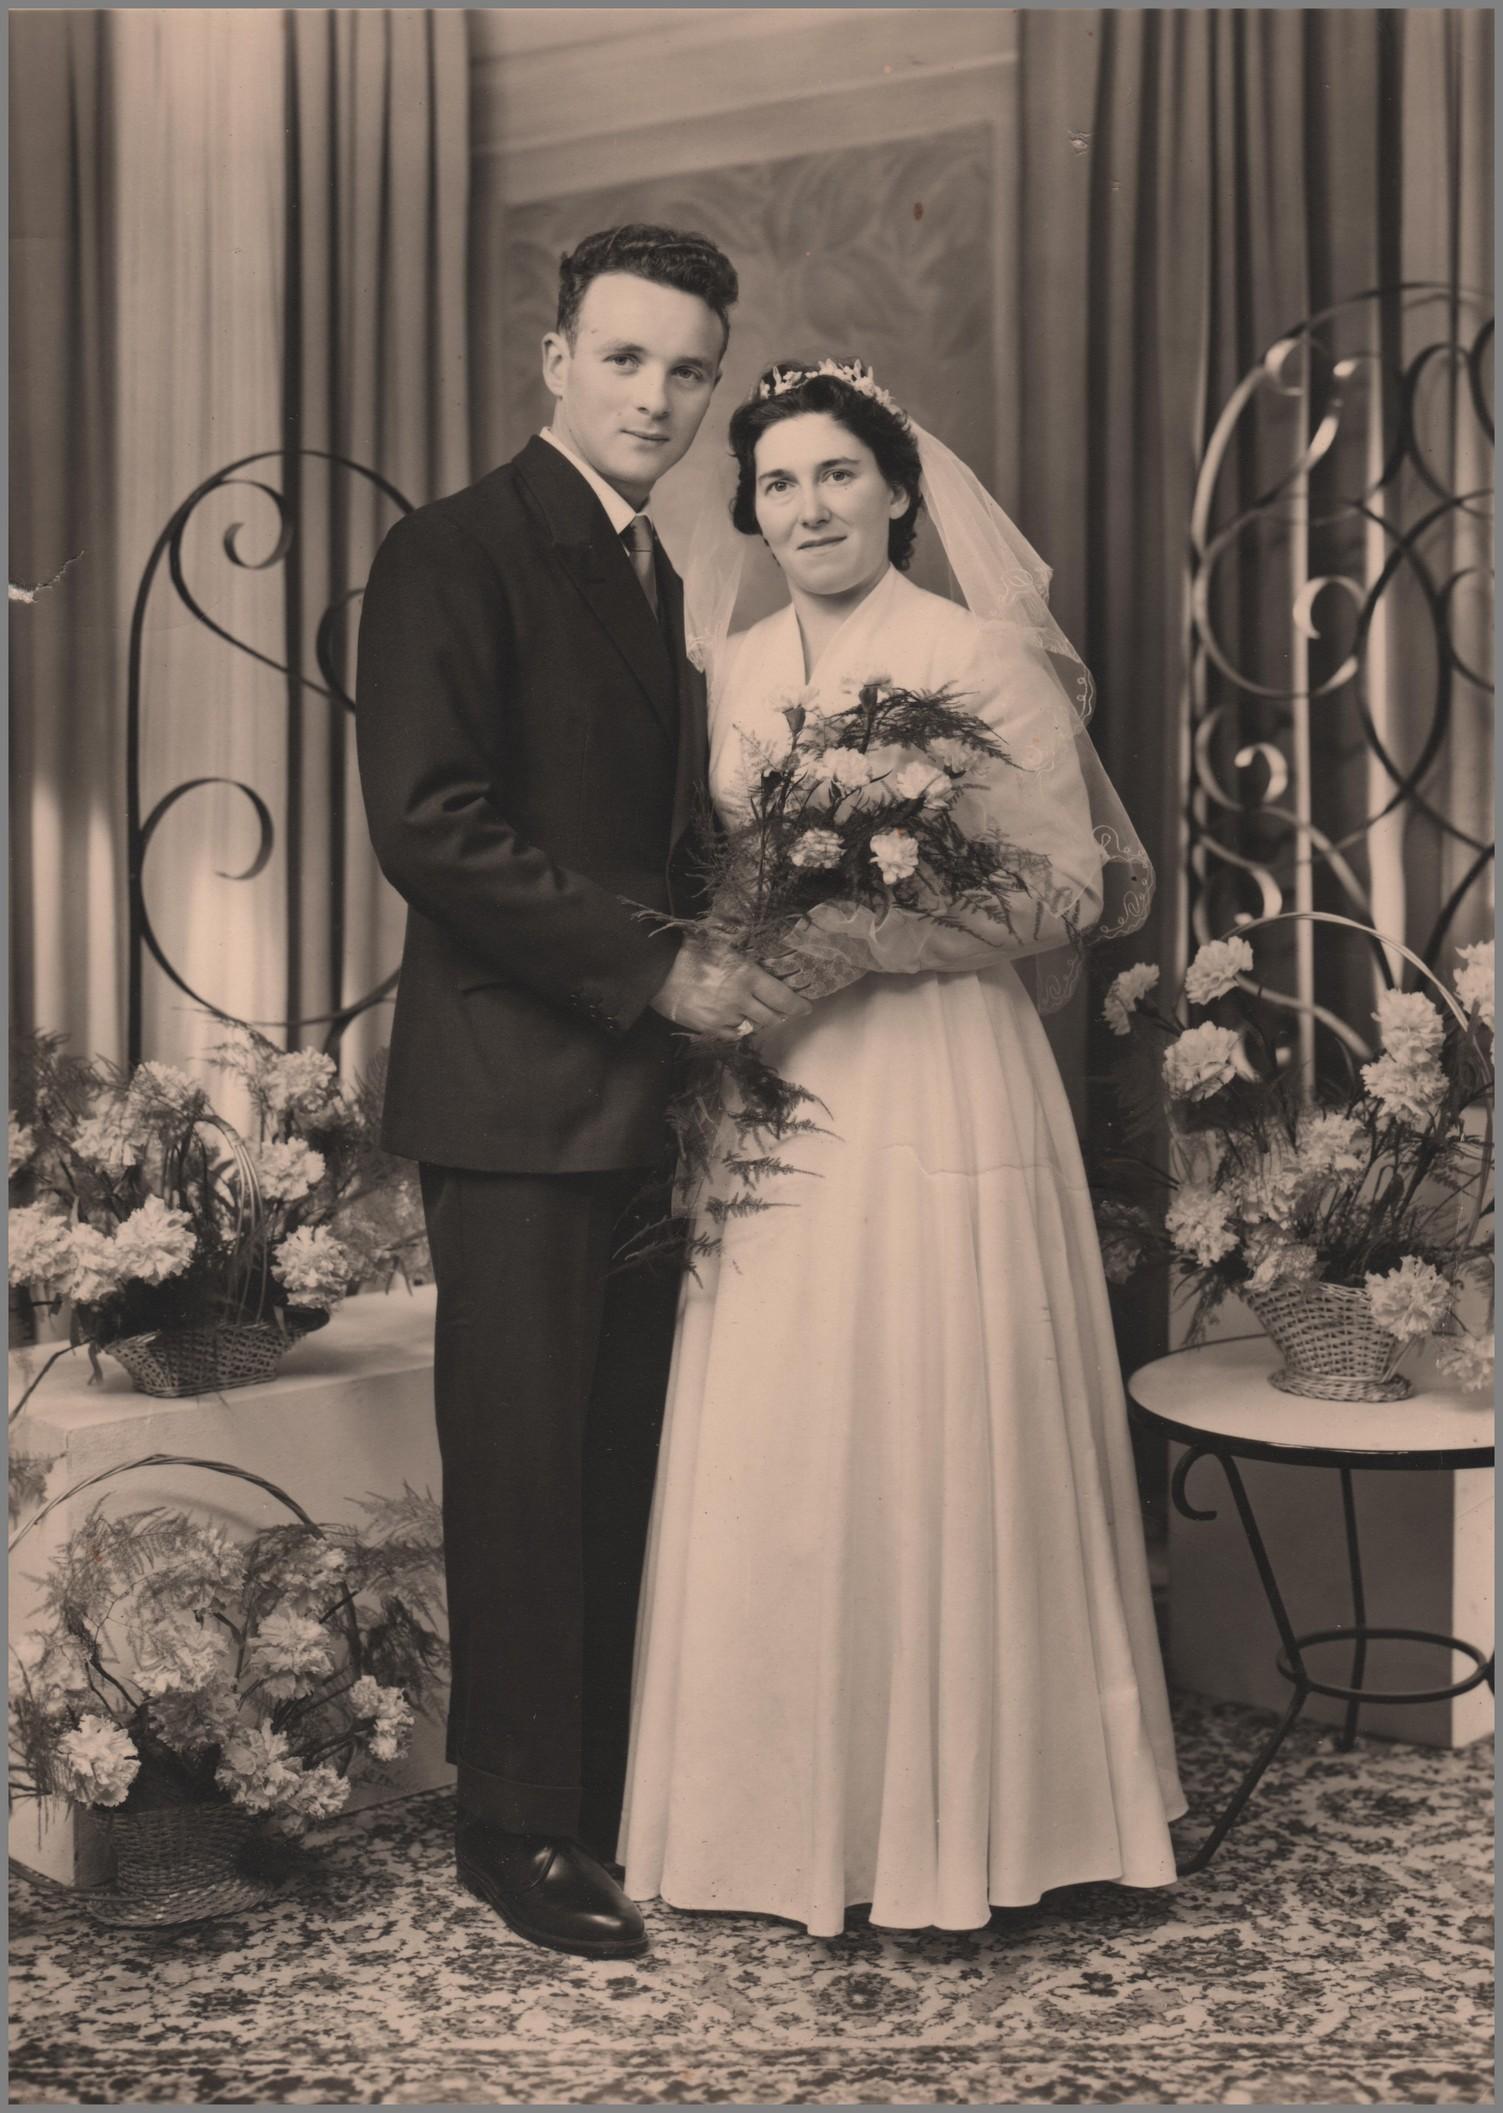 Sukupuu michel garault geneanet - Photo de mariage ...